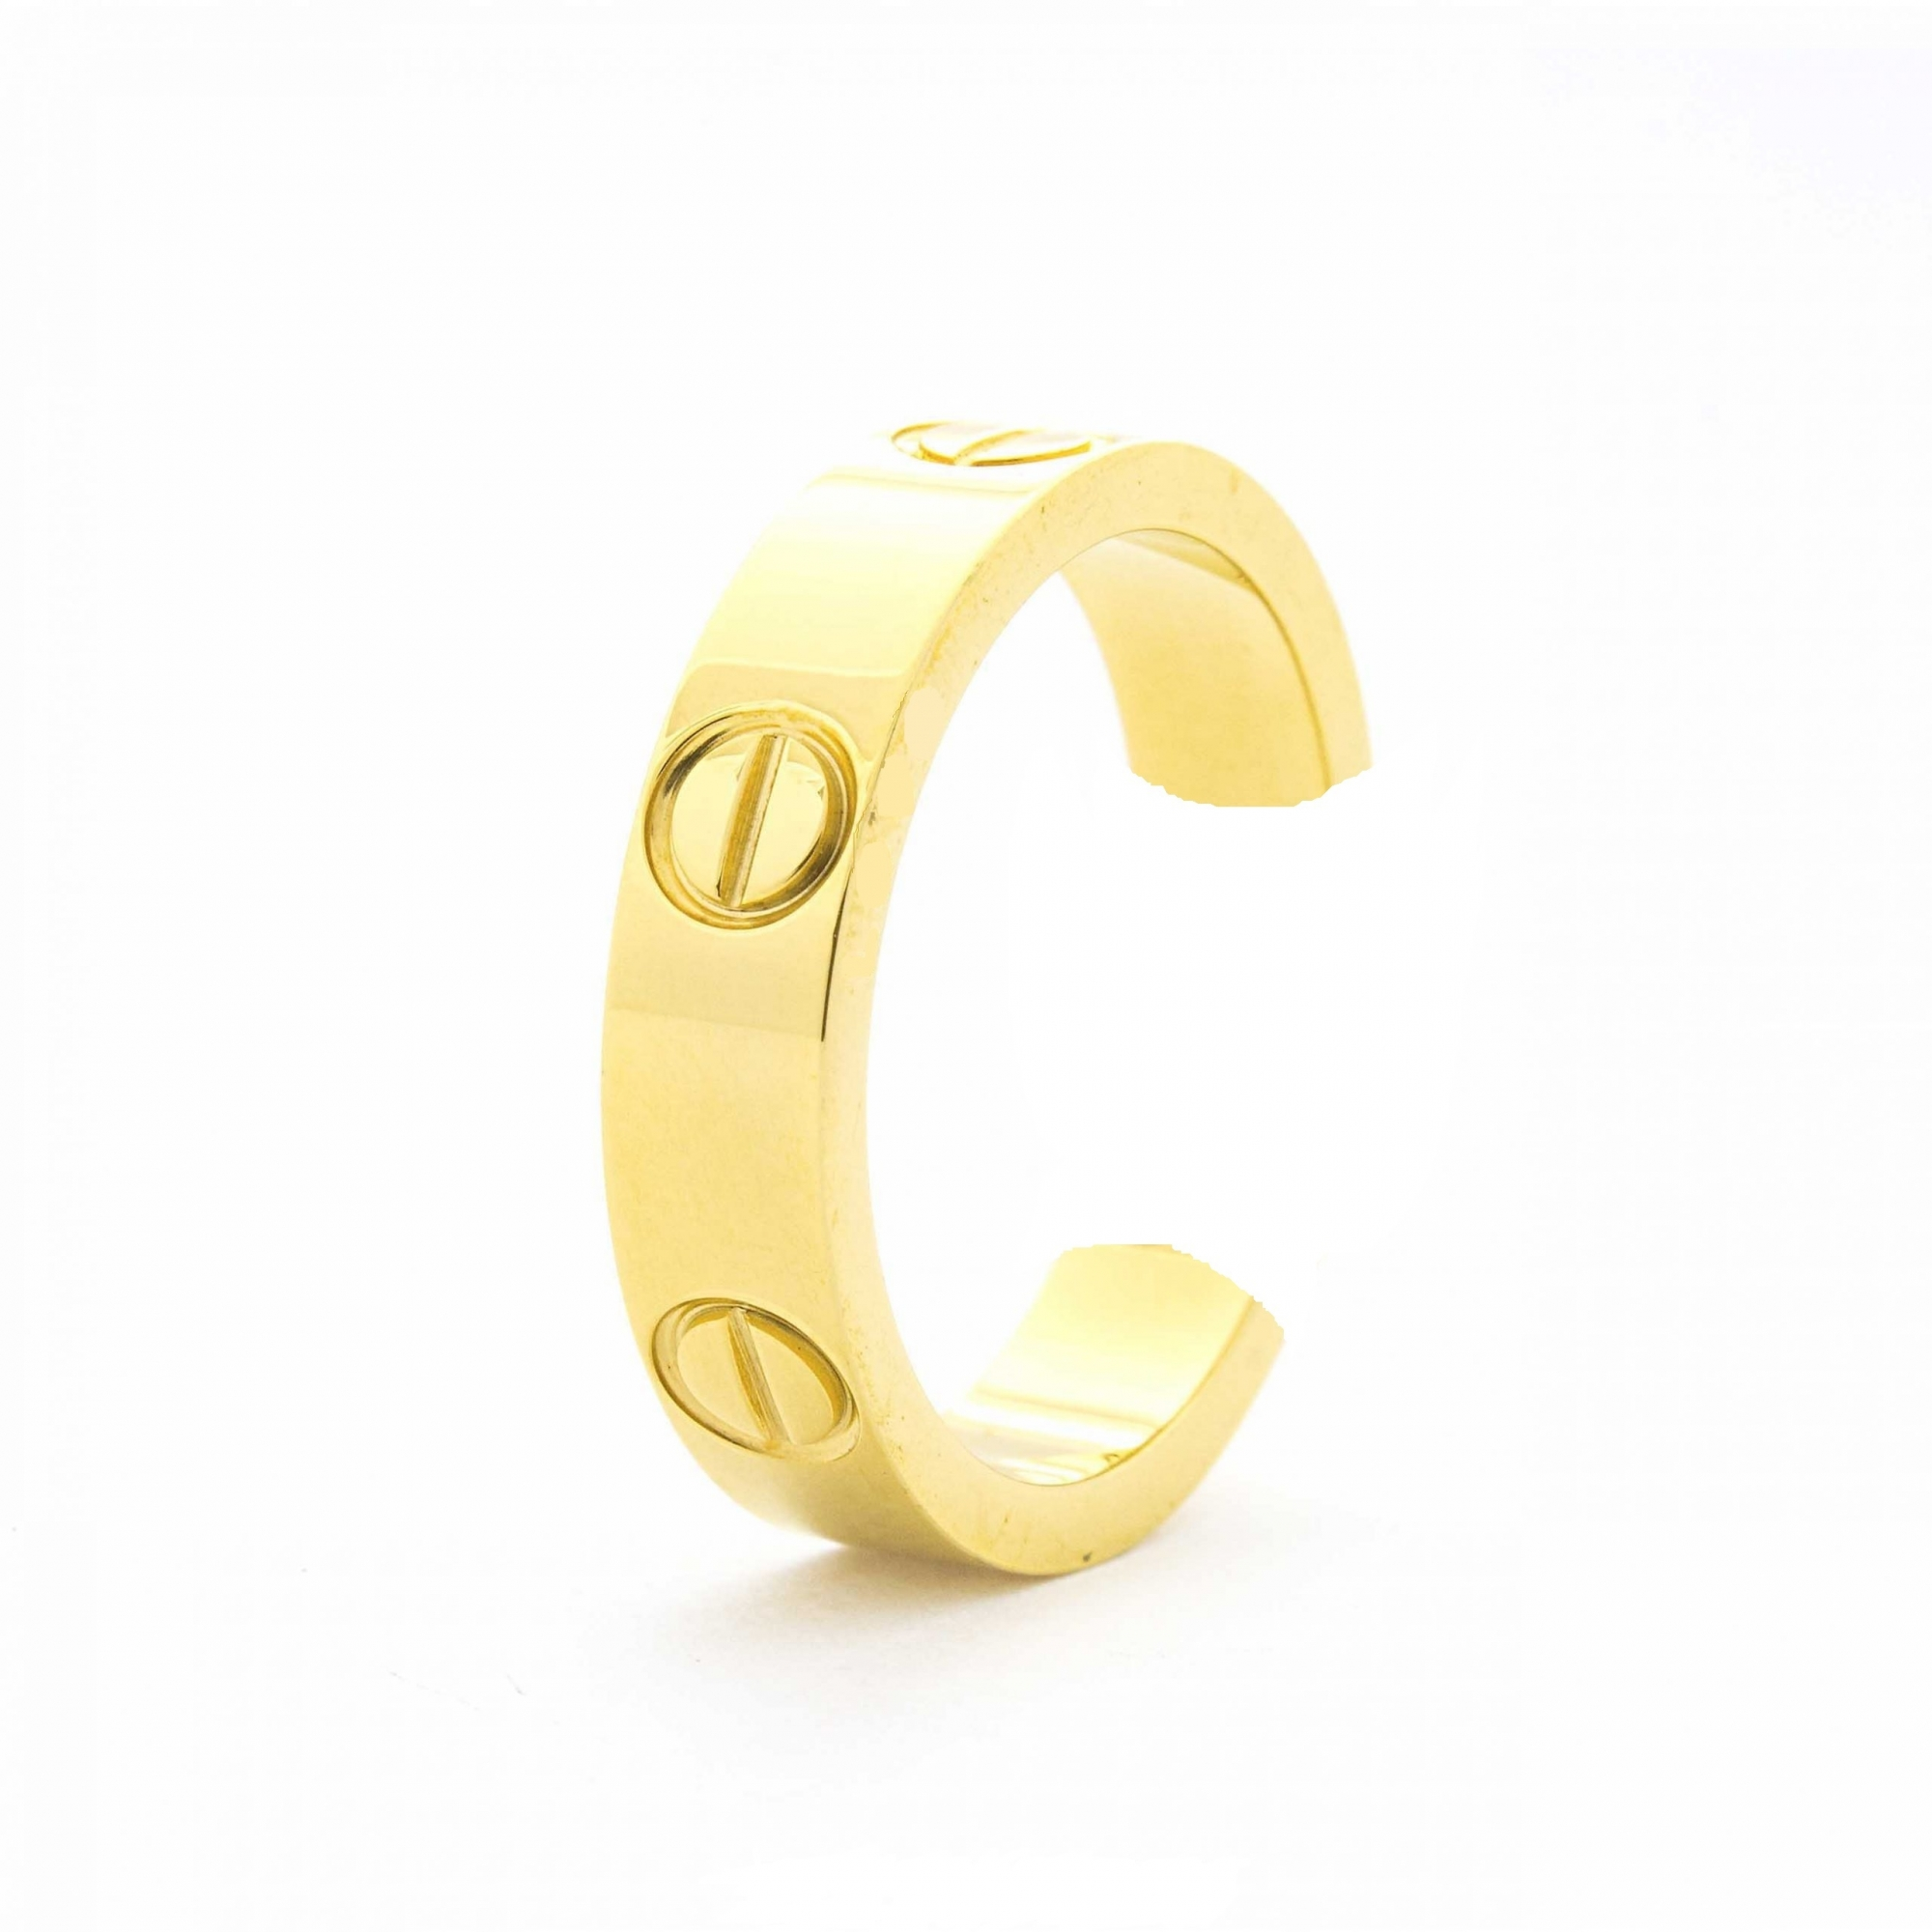 Brinco Piercing Fake Cartier Love 5217